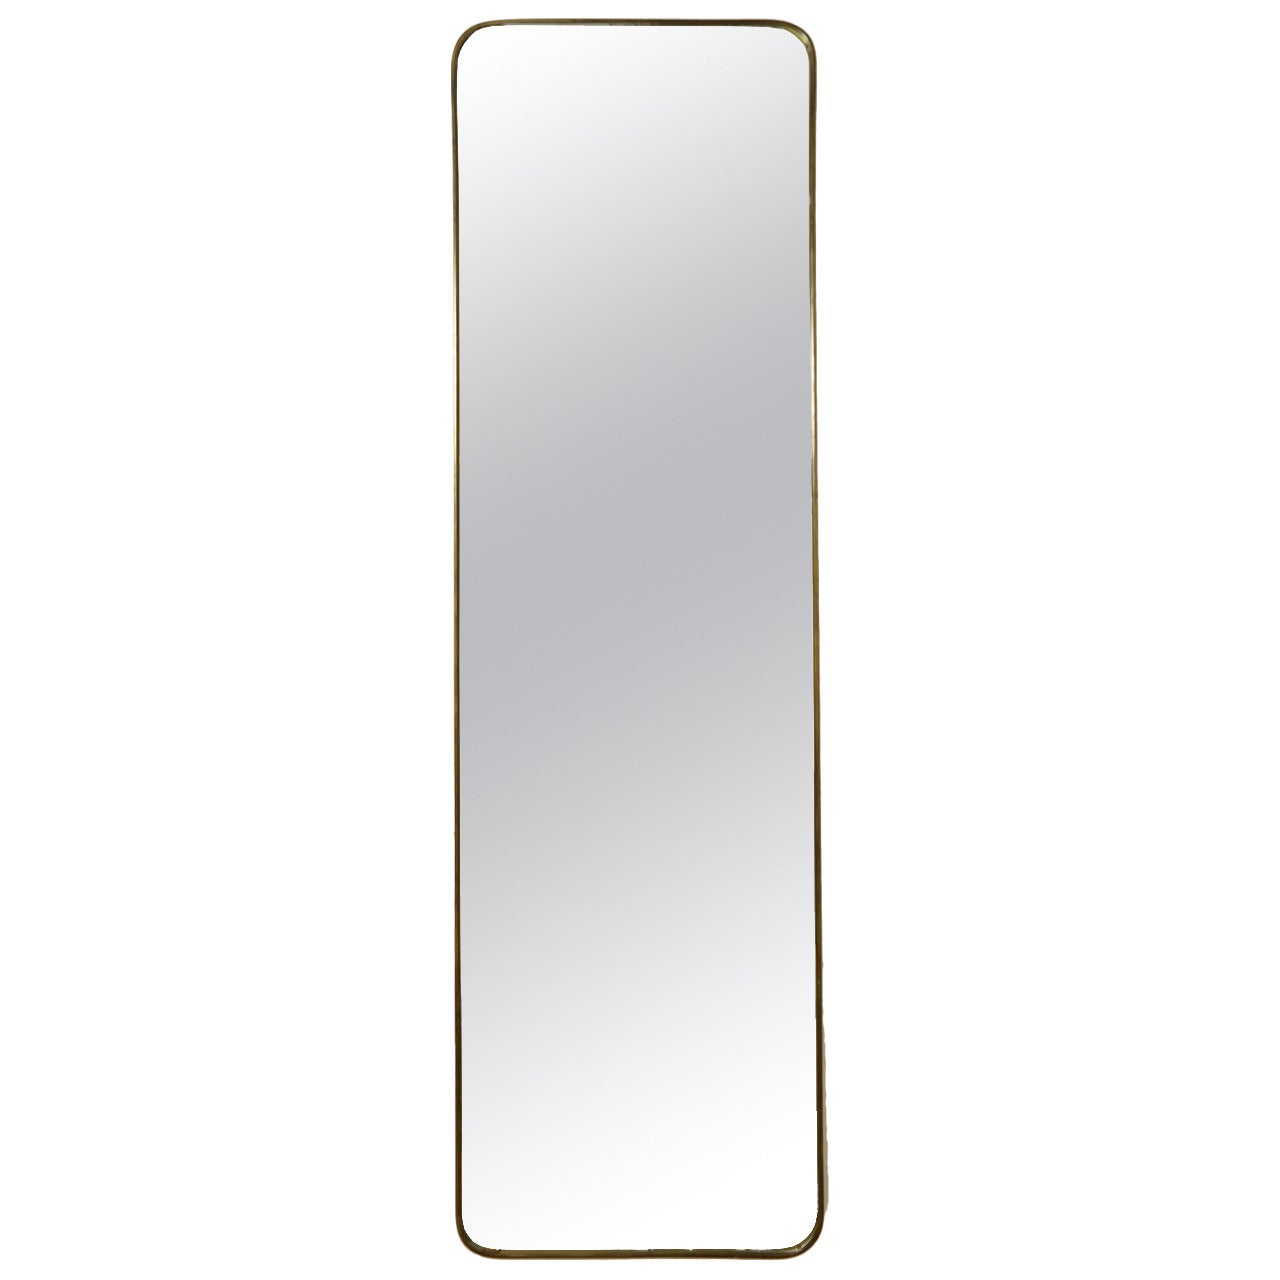 Mirror by Gio Ponti, Fontana Arte, Italy, 1959